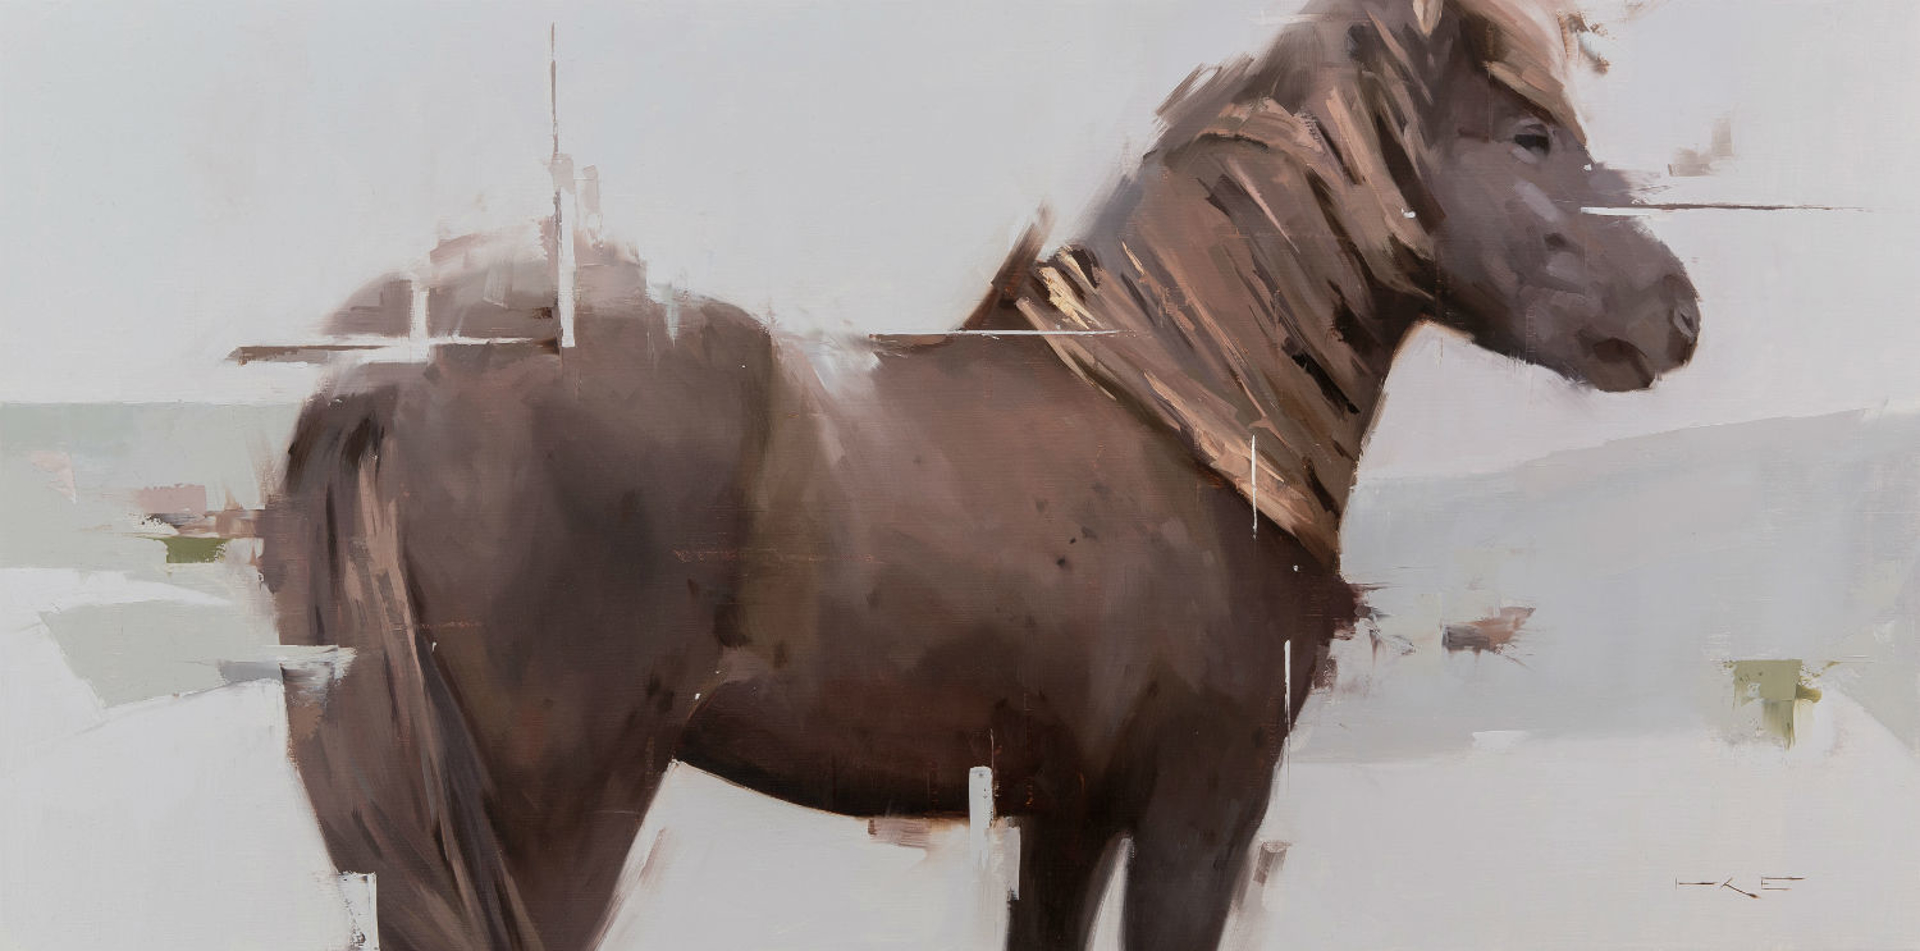 Icelandic Horse by Thorgrimur Einarsson